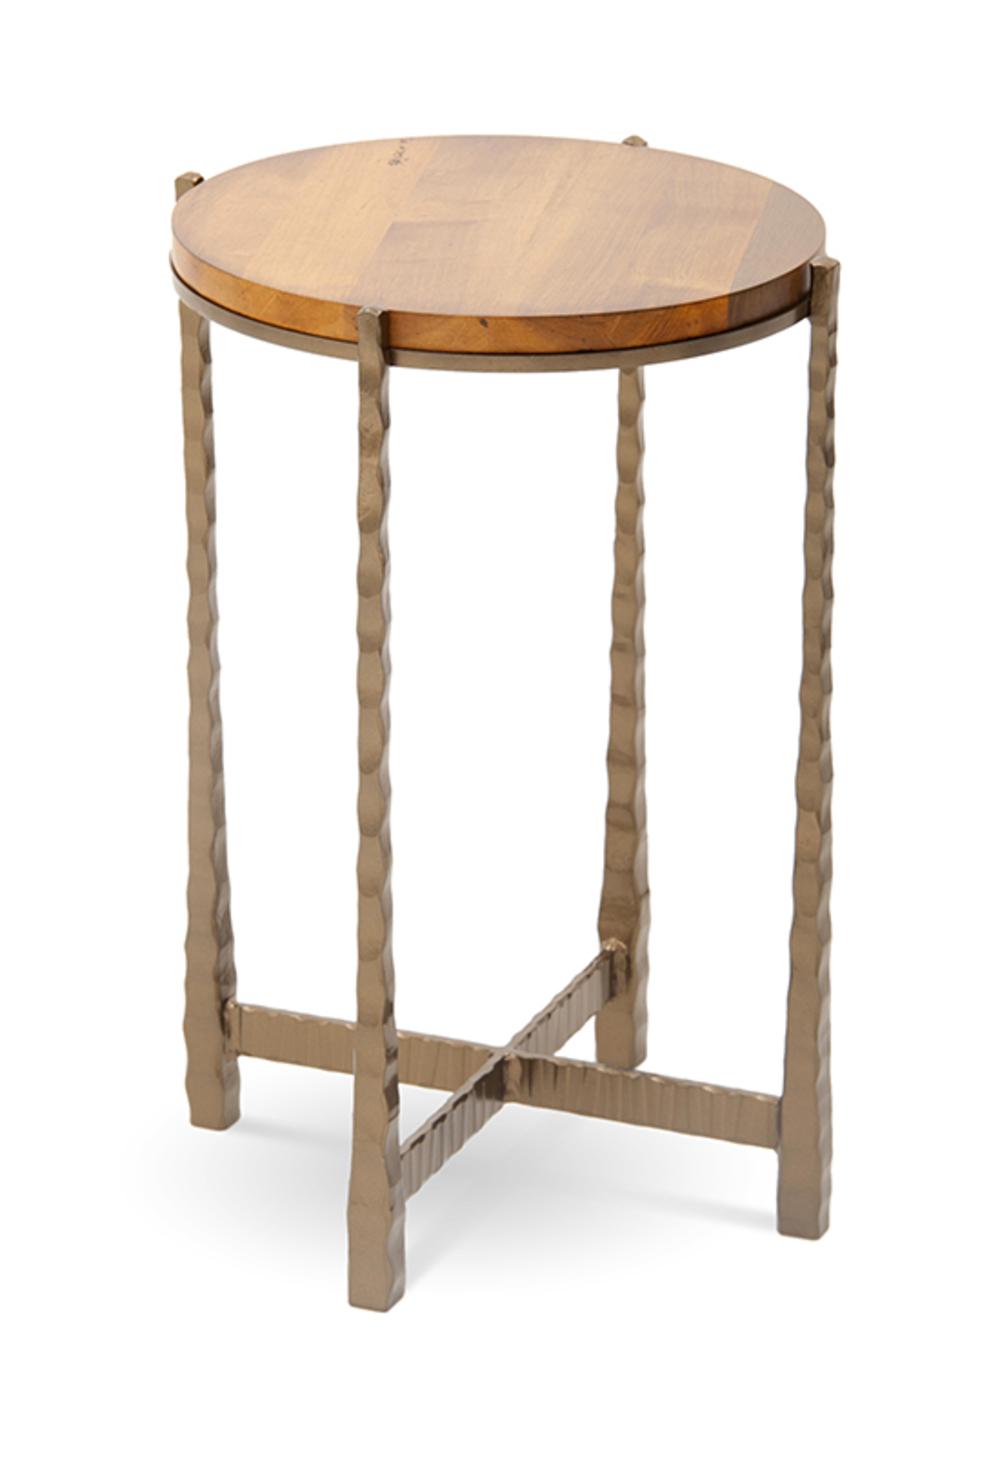 Charleston Forge - Nash Round Drink Table